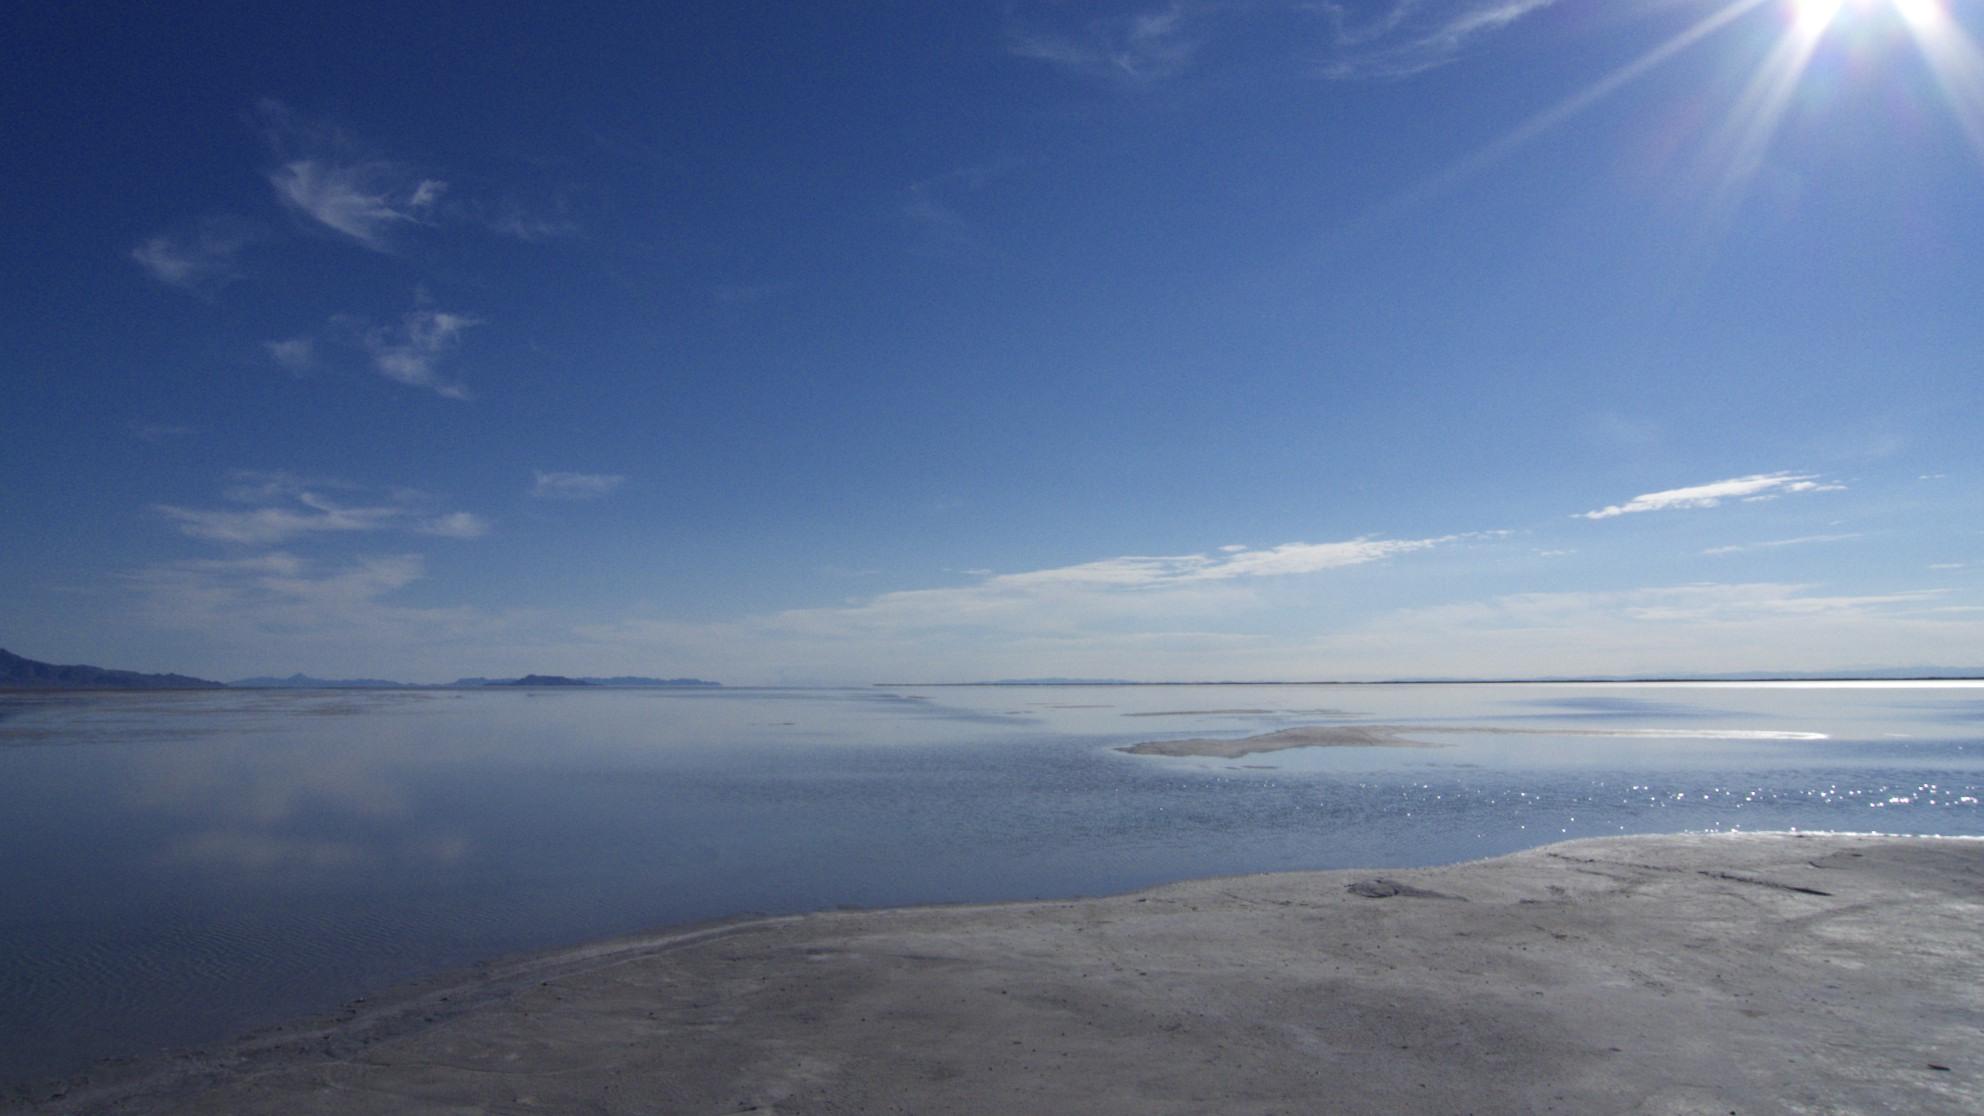 Water on the Bonneville Salt Flats, Wendover, Utah.